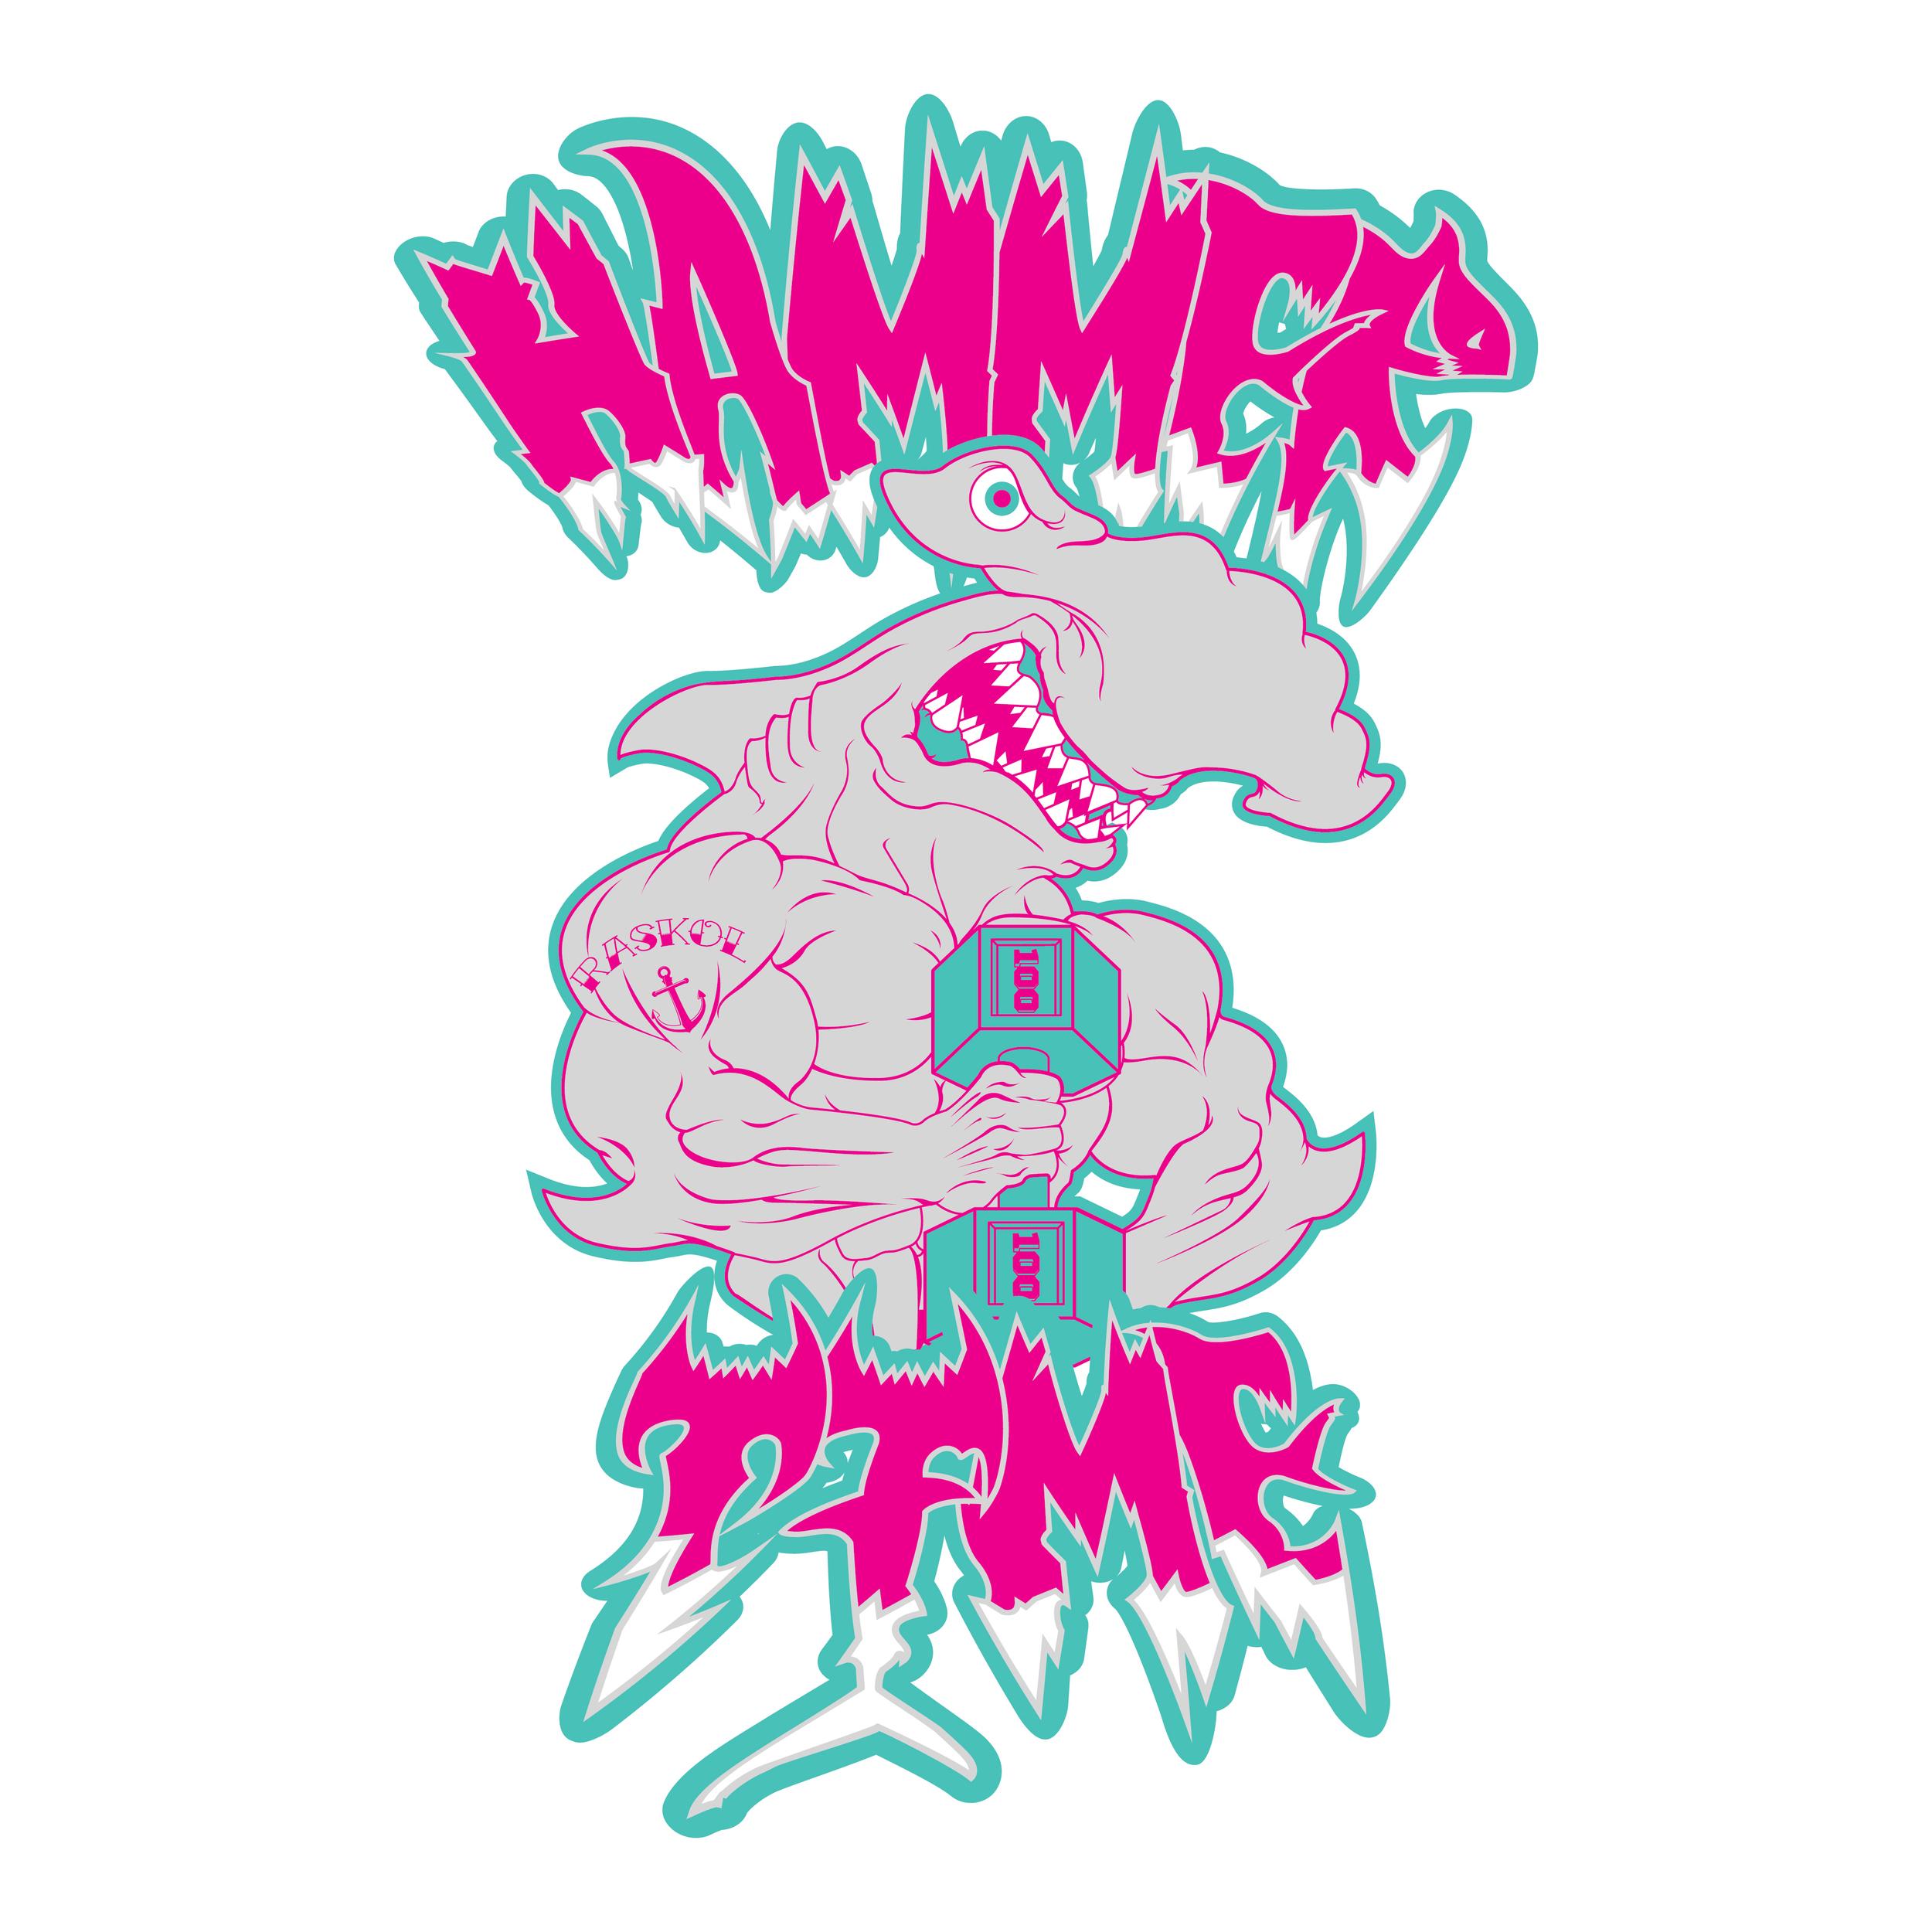 hammertime-hammerhead-shark-jawsome-streetsharks-illustration-raskol-apparel-omarisuf-orozcodesign-roberto-orozco-artist-vector-art.jpg